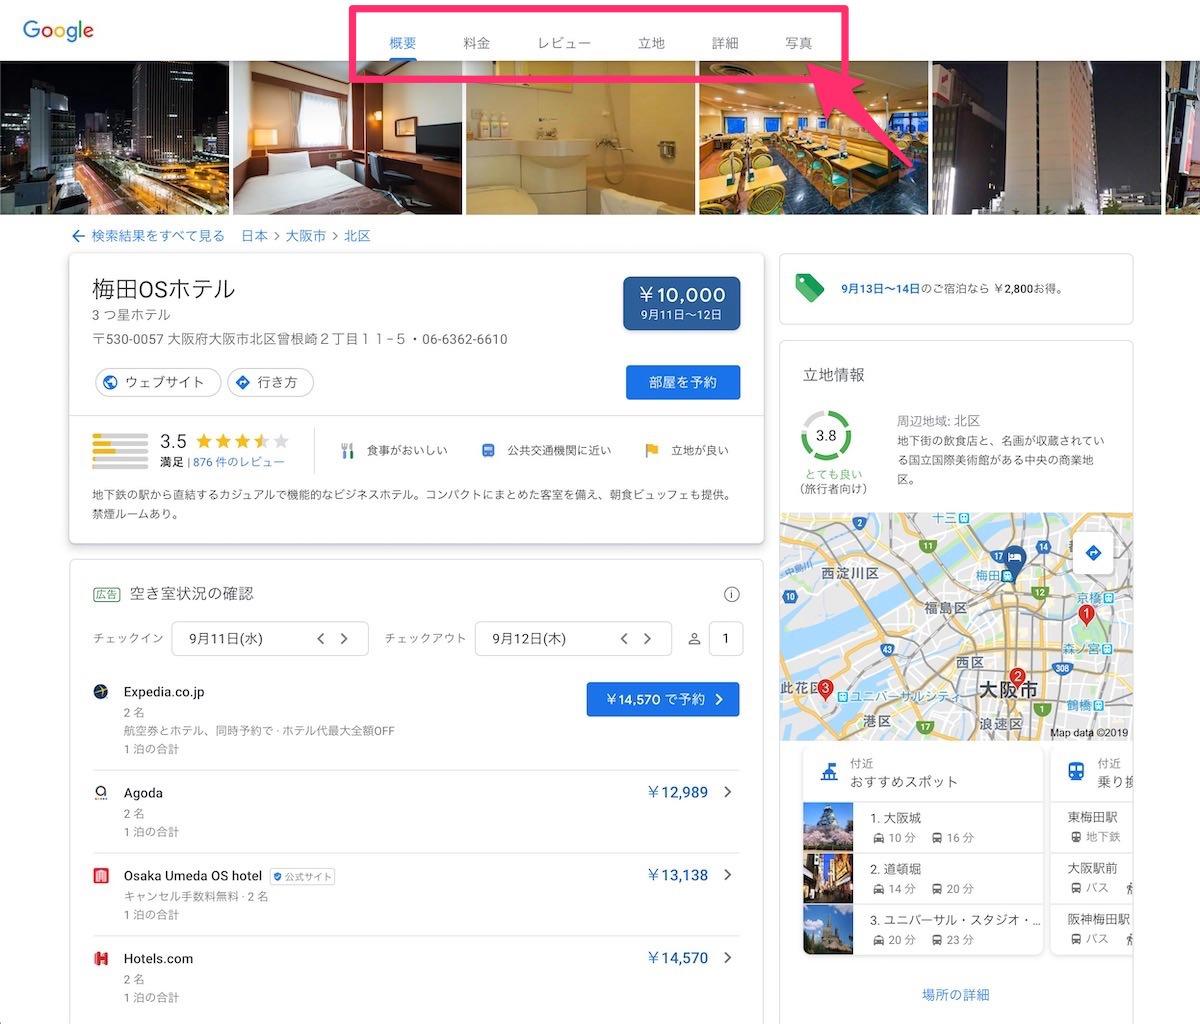 google-hotel-search_6